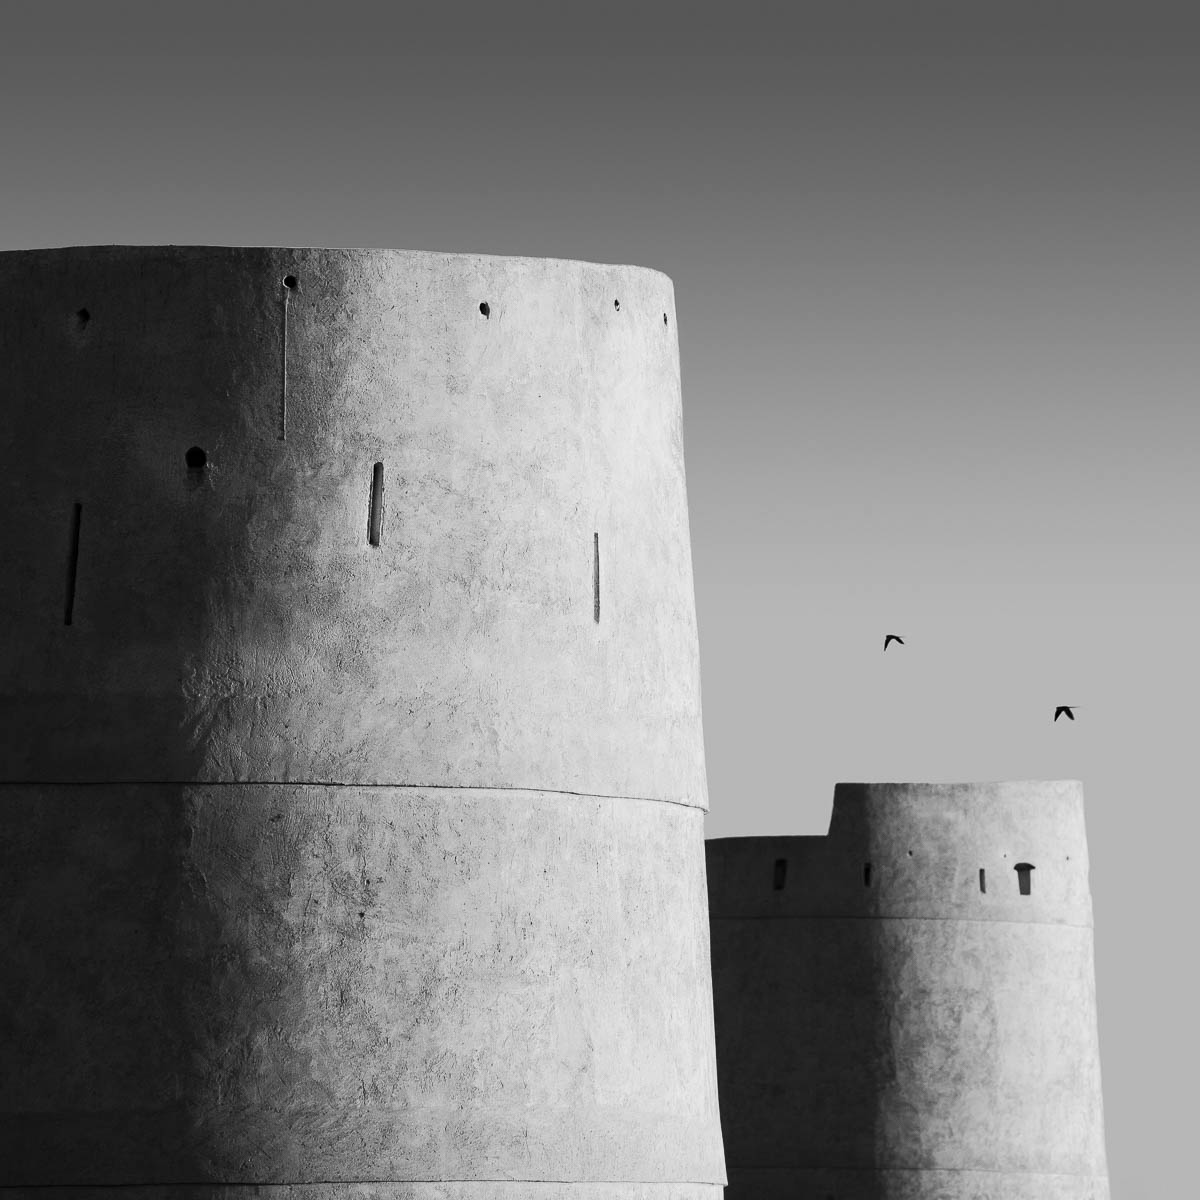 The castle wall, Umm Al Qwain, UAE